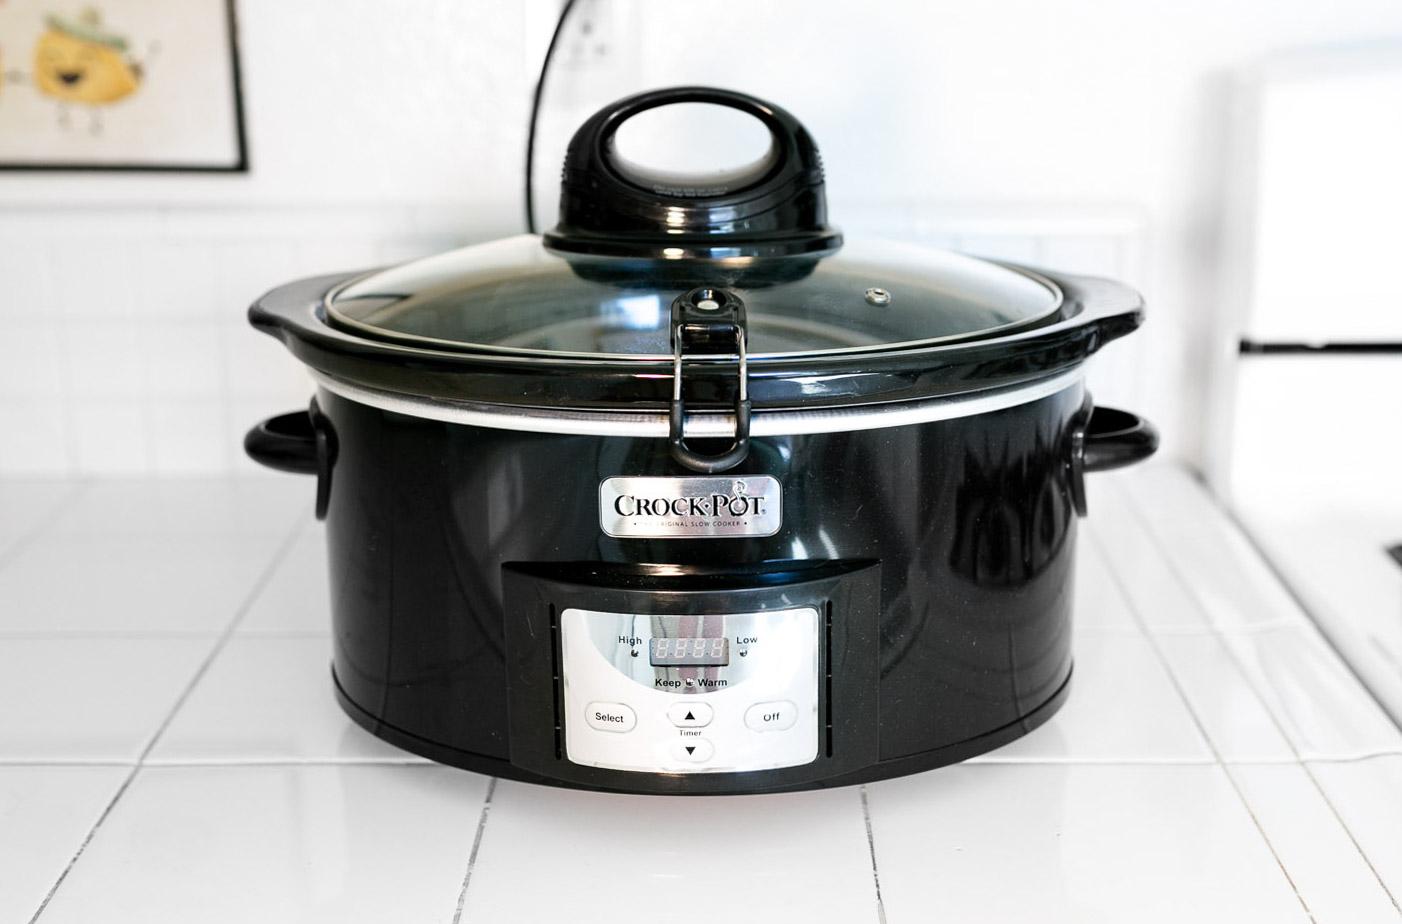 Crock pot with lid fastener